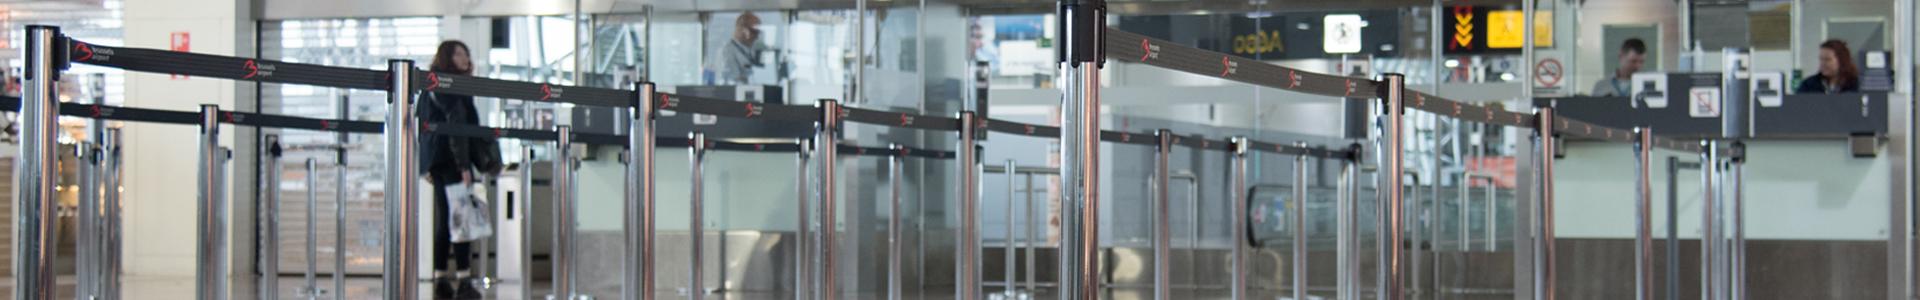 airport passenger flow